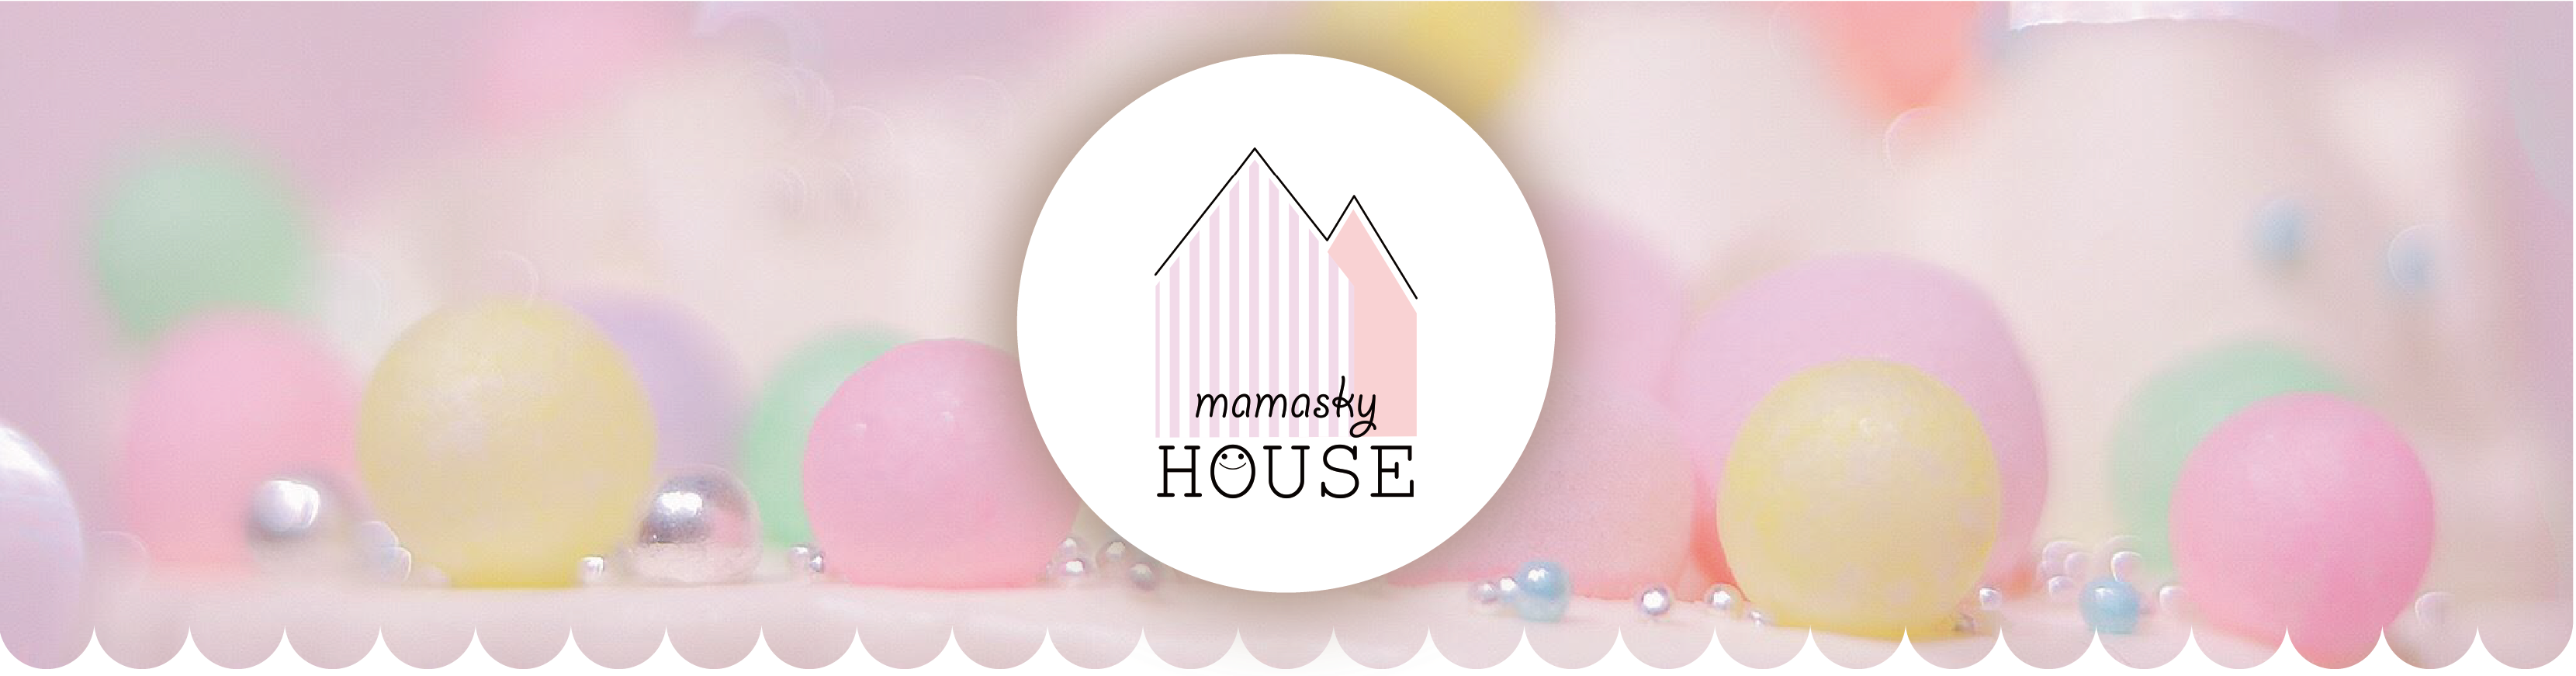 mamasky house ママスキーハウス